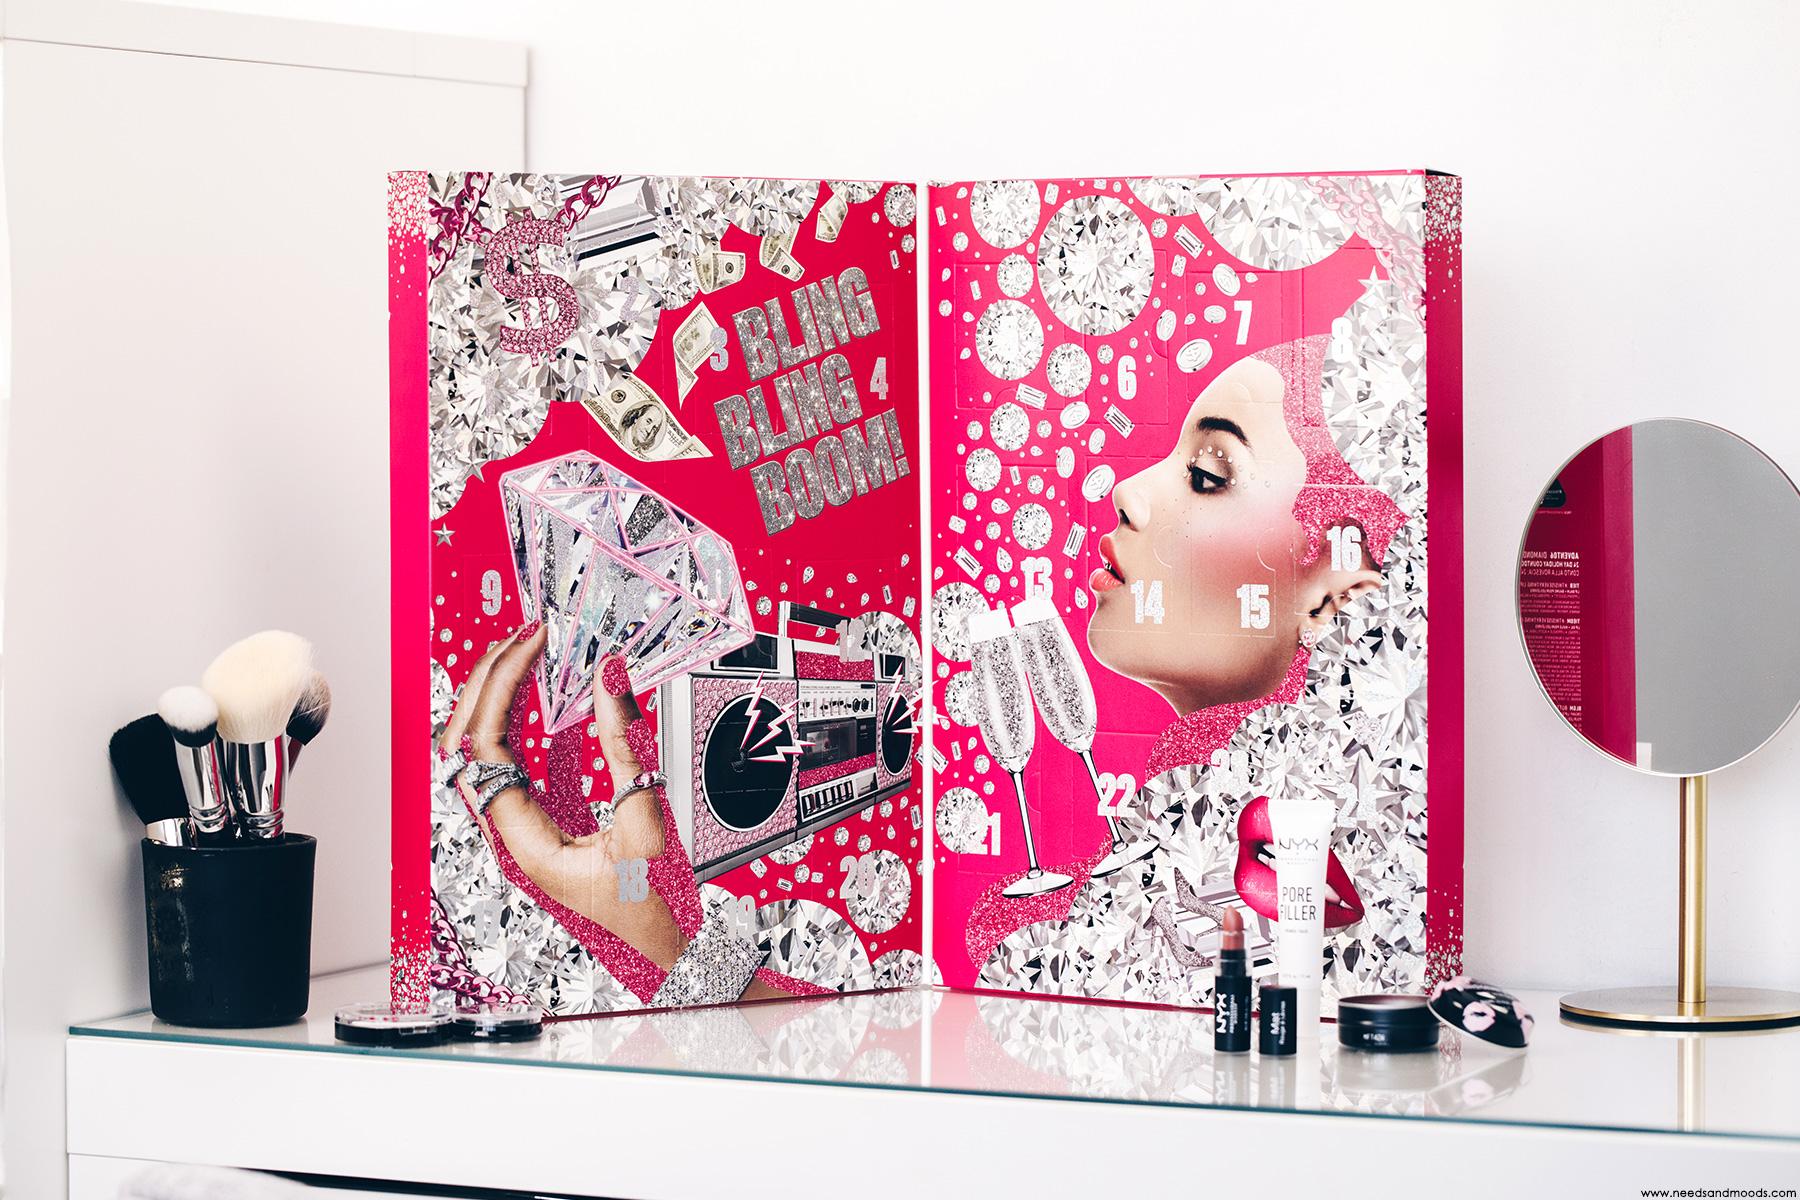 nyx professional makeup calendrier de lavent 2020